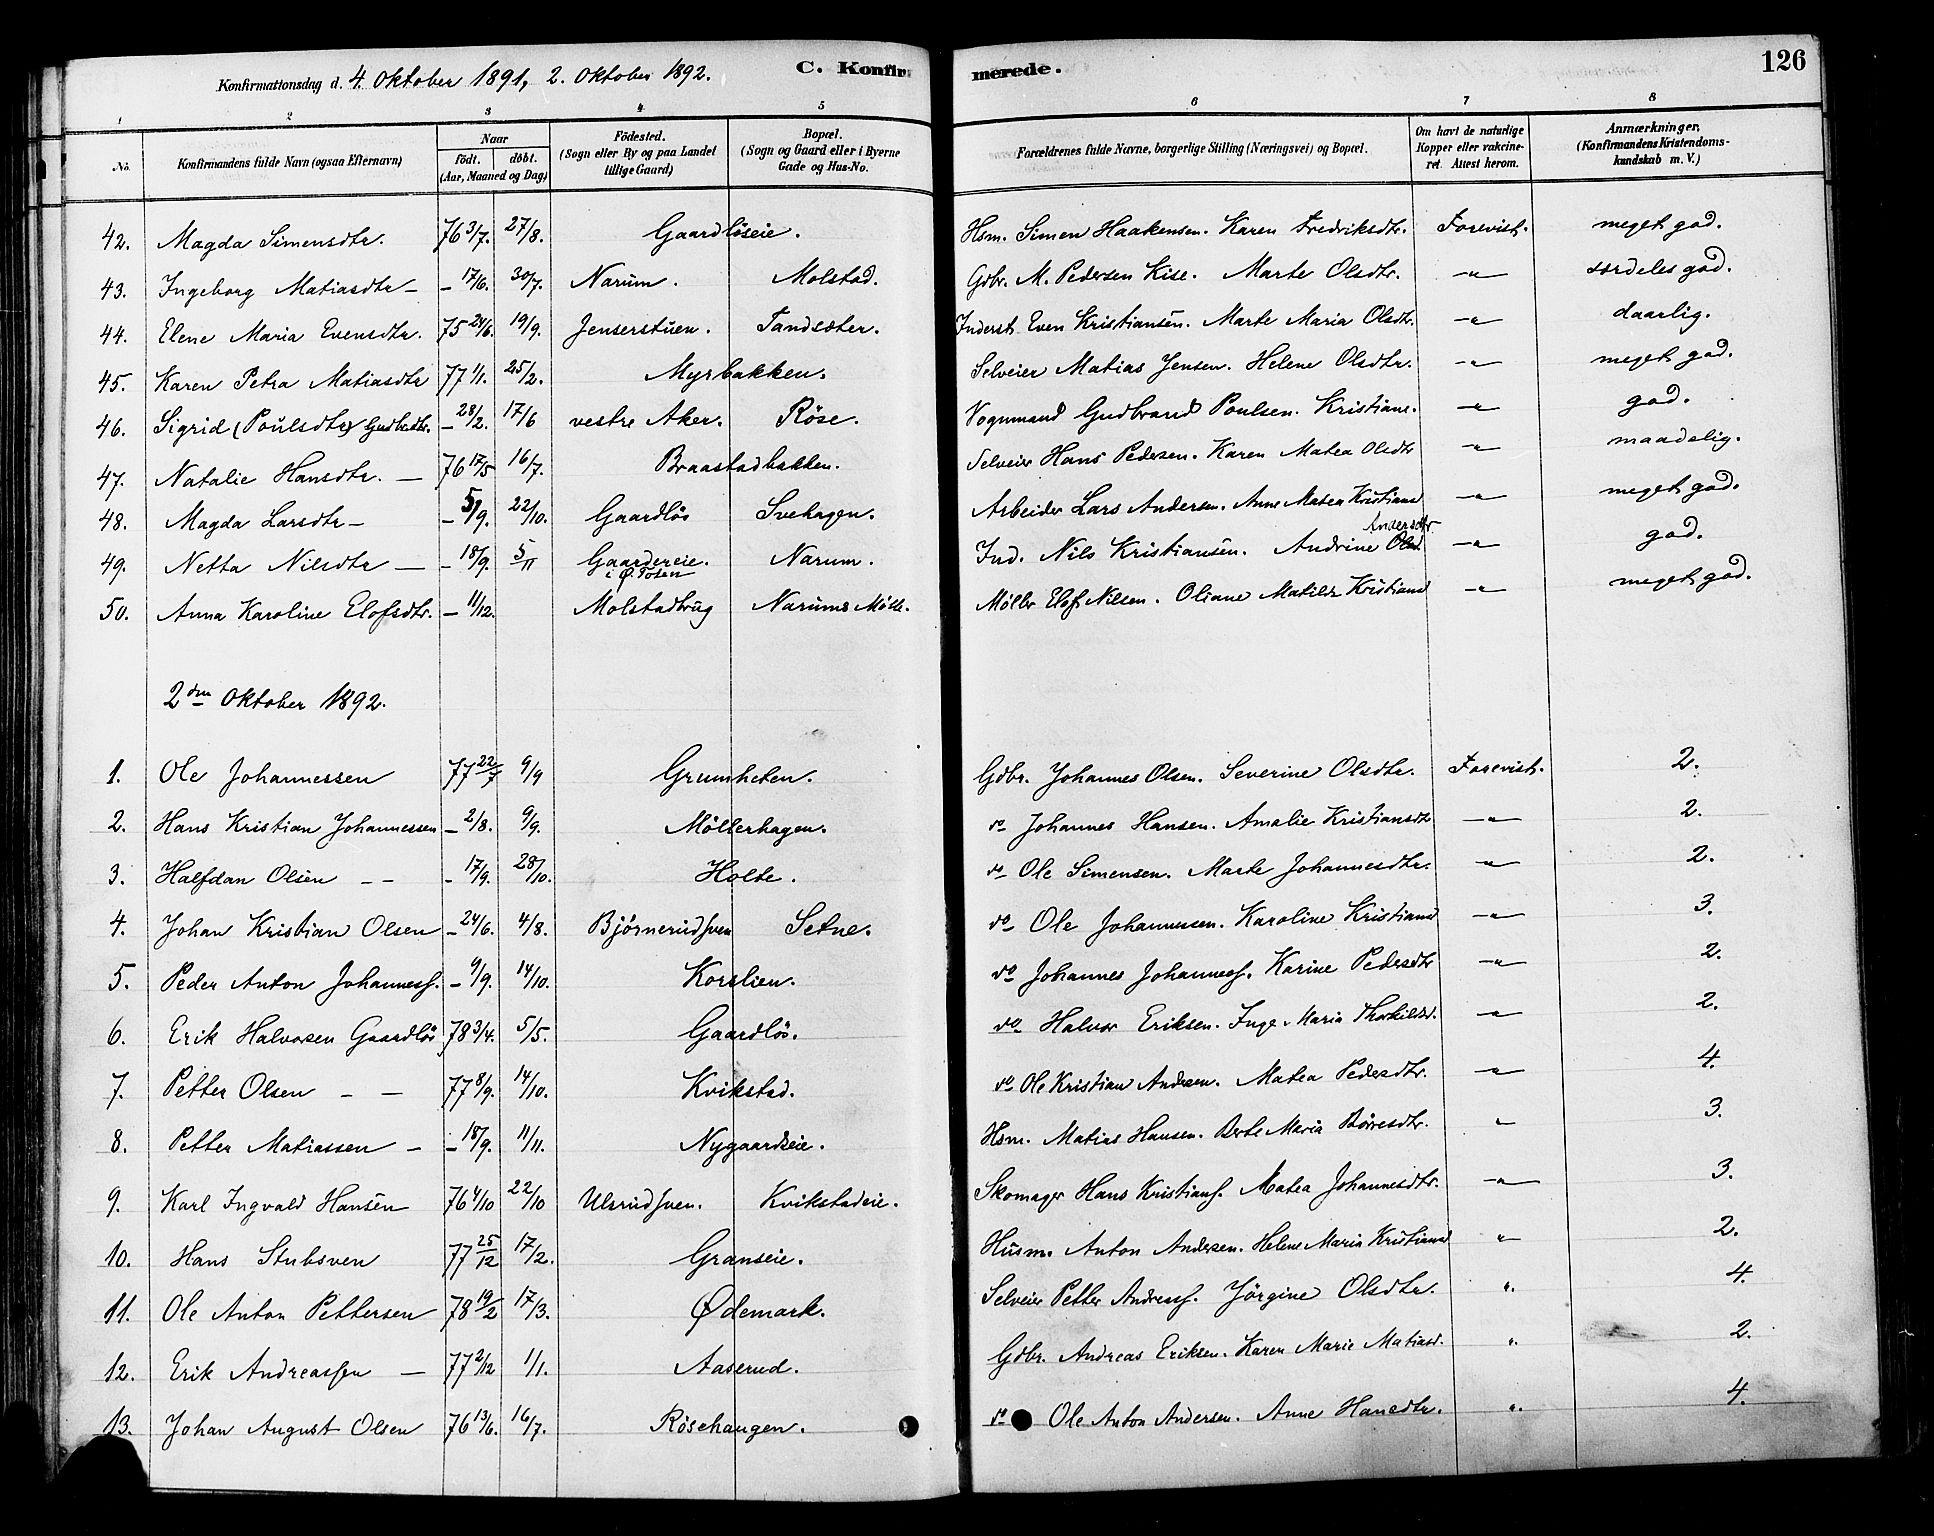 SAH, Vestre Toten prestekontor, H/Ha/Haa/L0010: Ministerialbok nr. 10, 1878-1894, s. 126